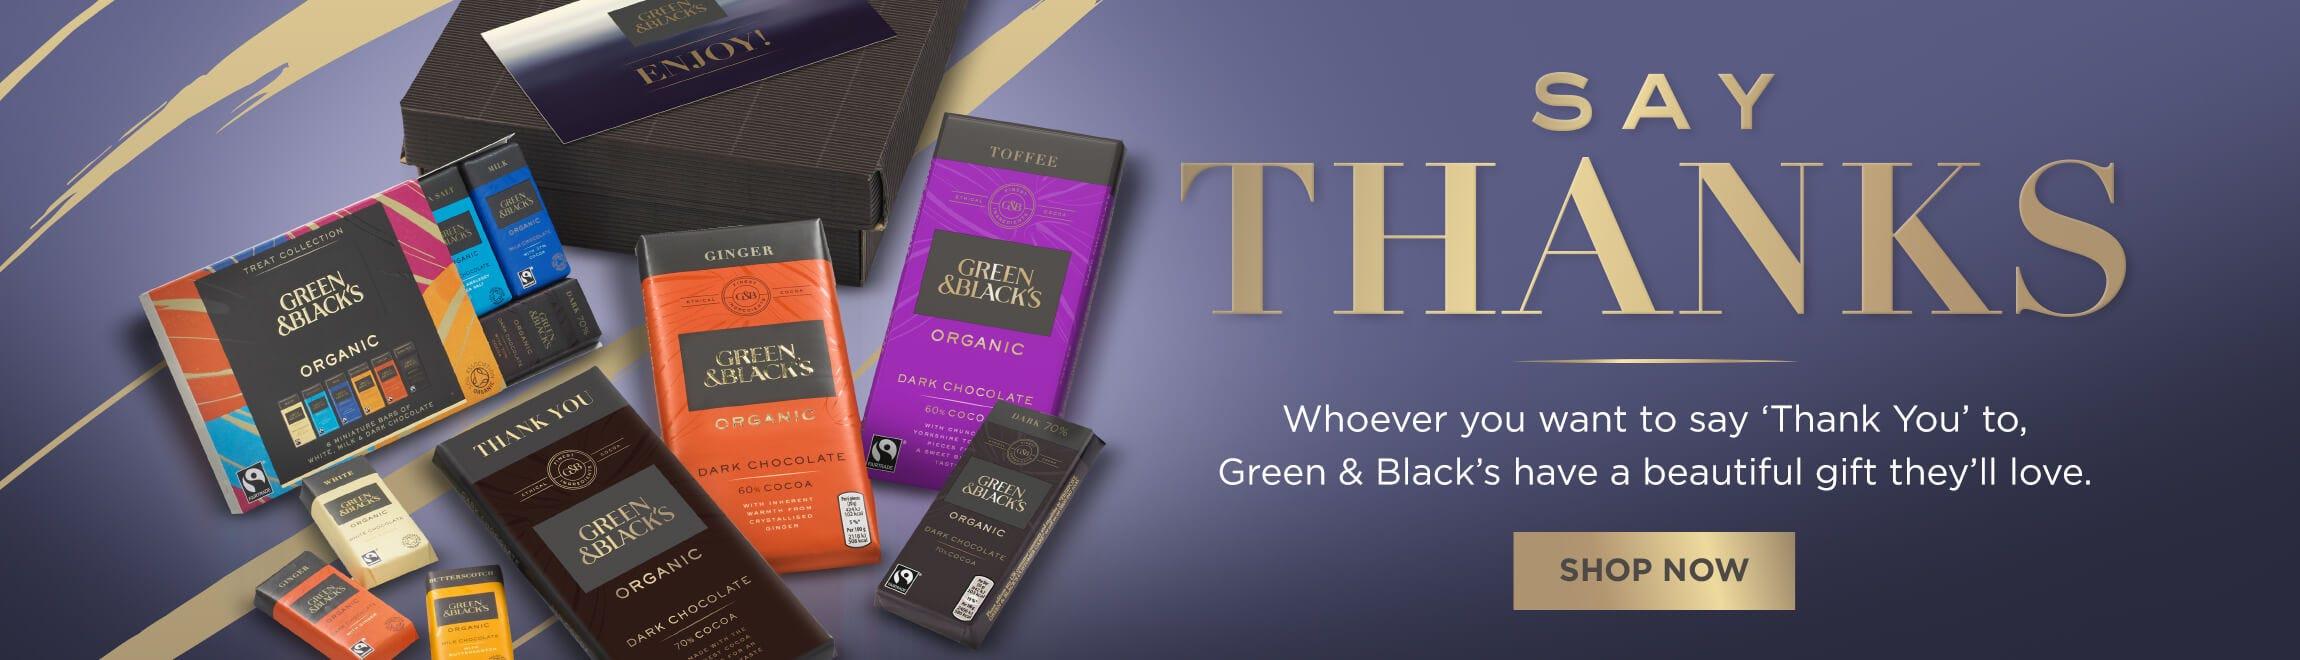 Green & Black's Organic Thank You Gifts